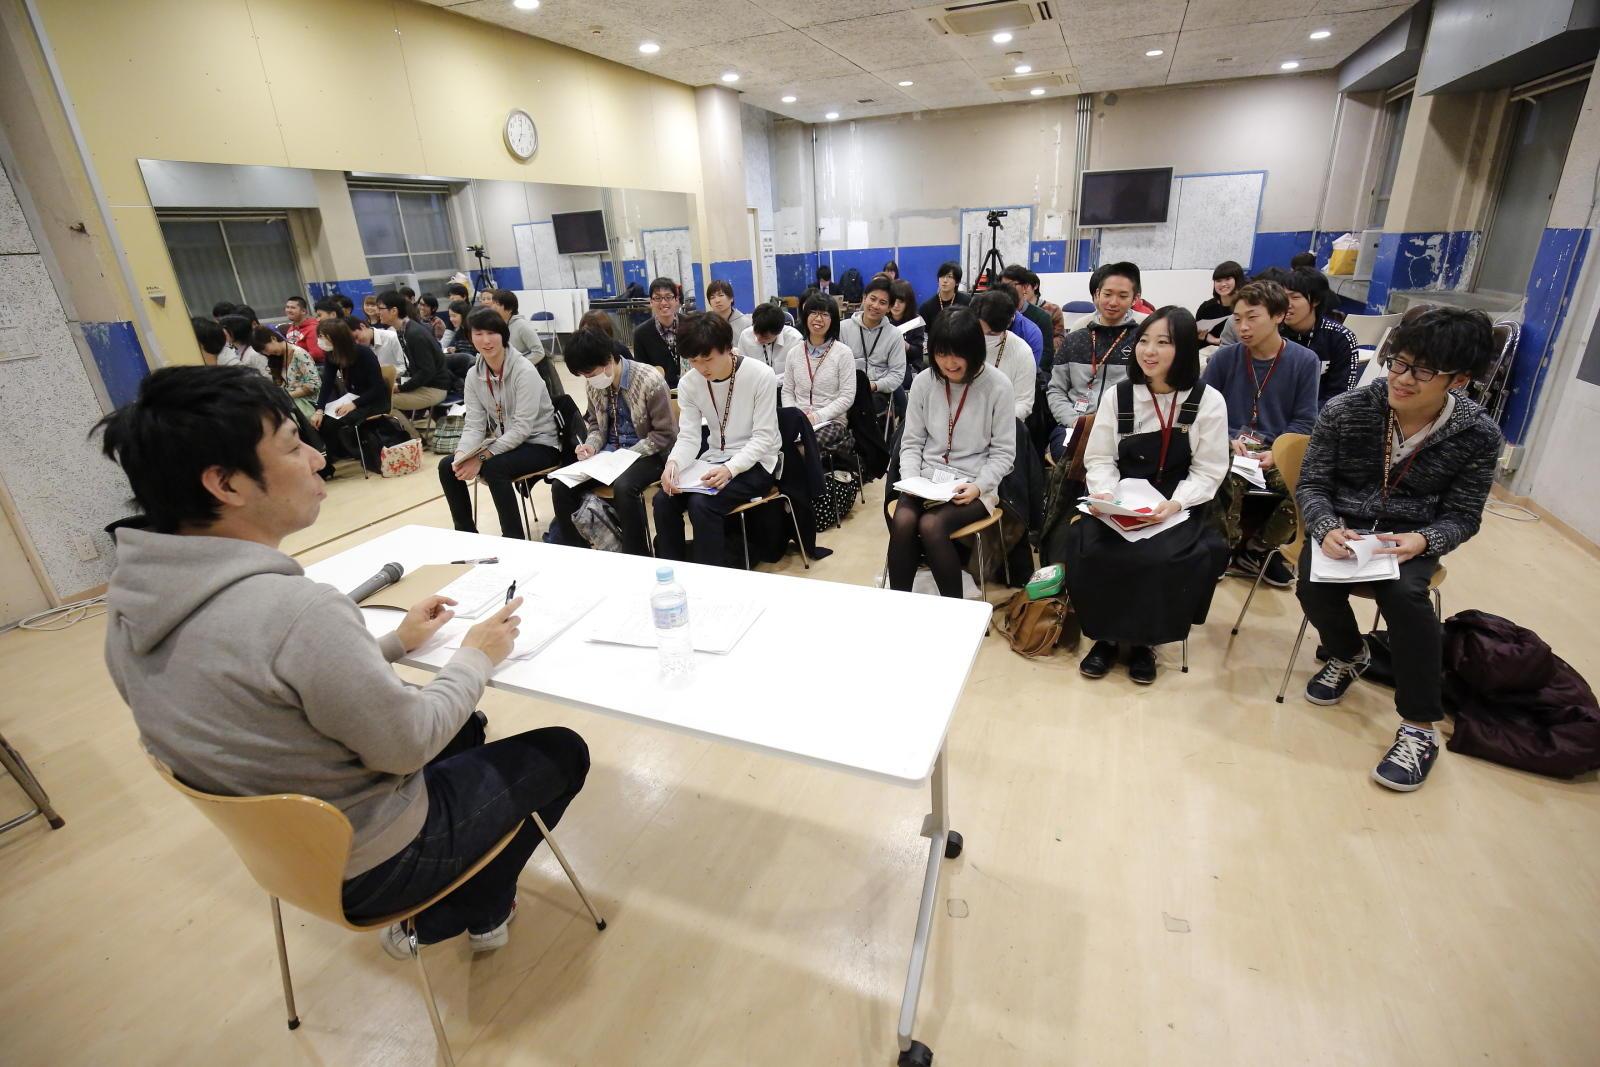 http://news.yoshimoto.co.jp/20160127192324-8d4cdc9ec4766e1dc9b176407c7cc287d3017c8b.jpg